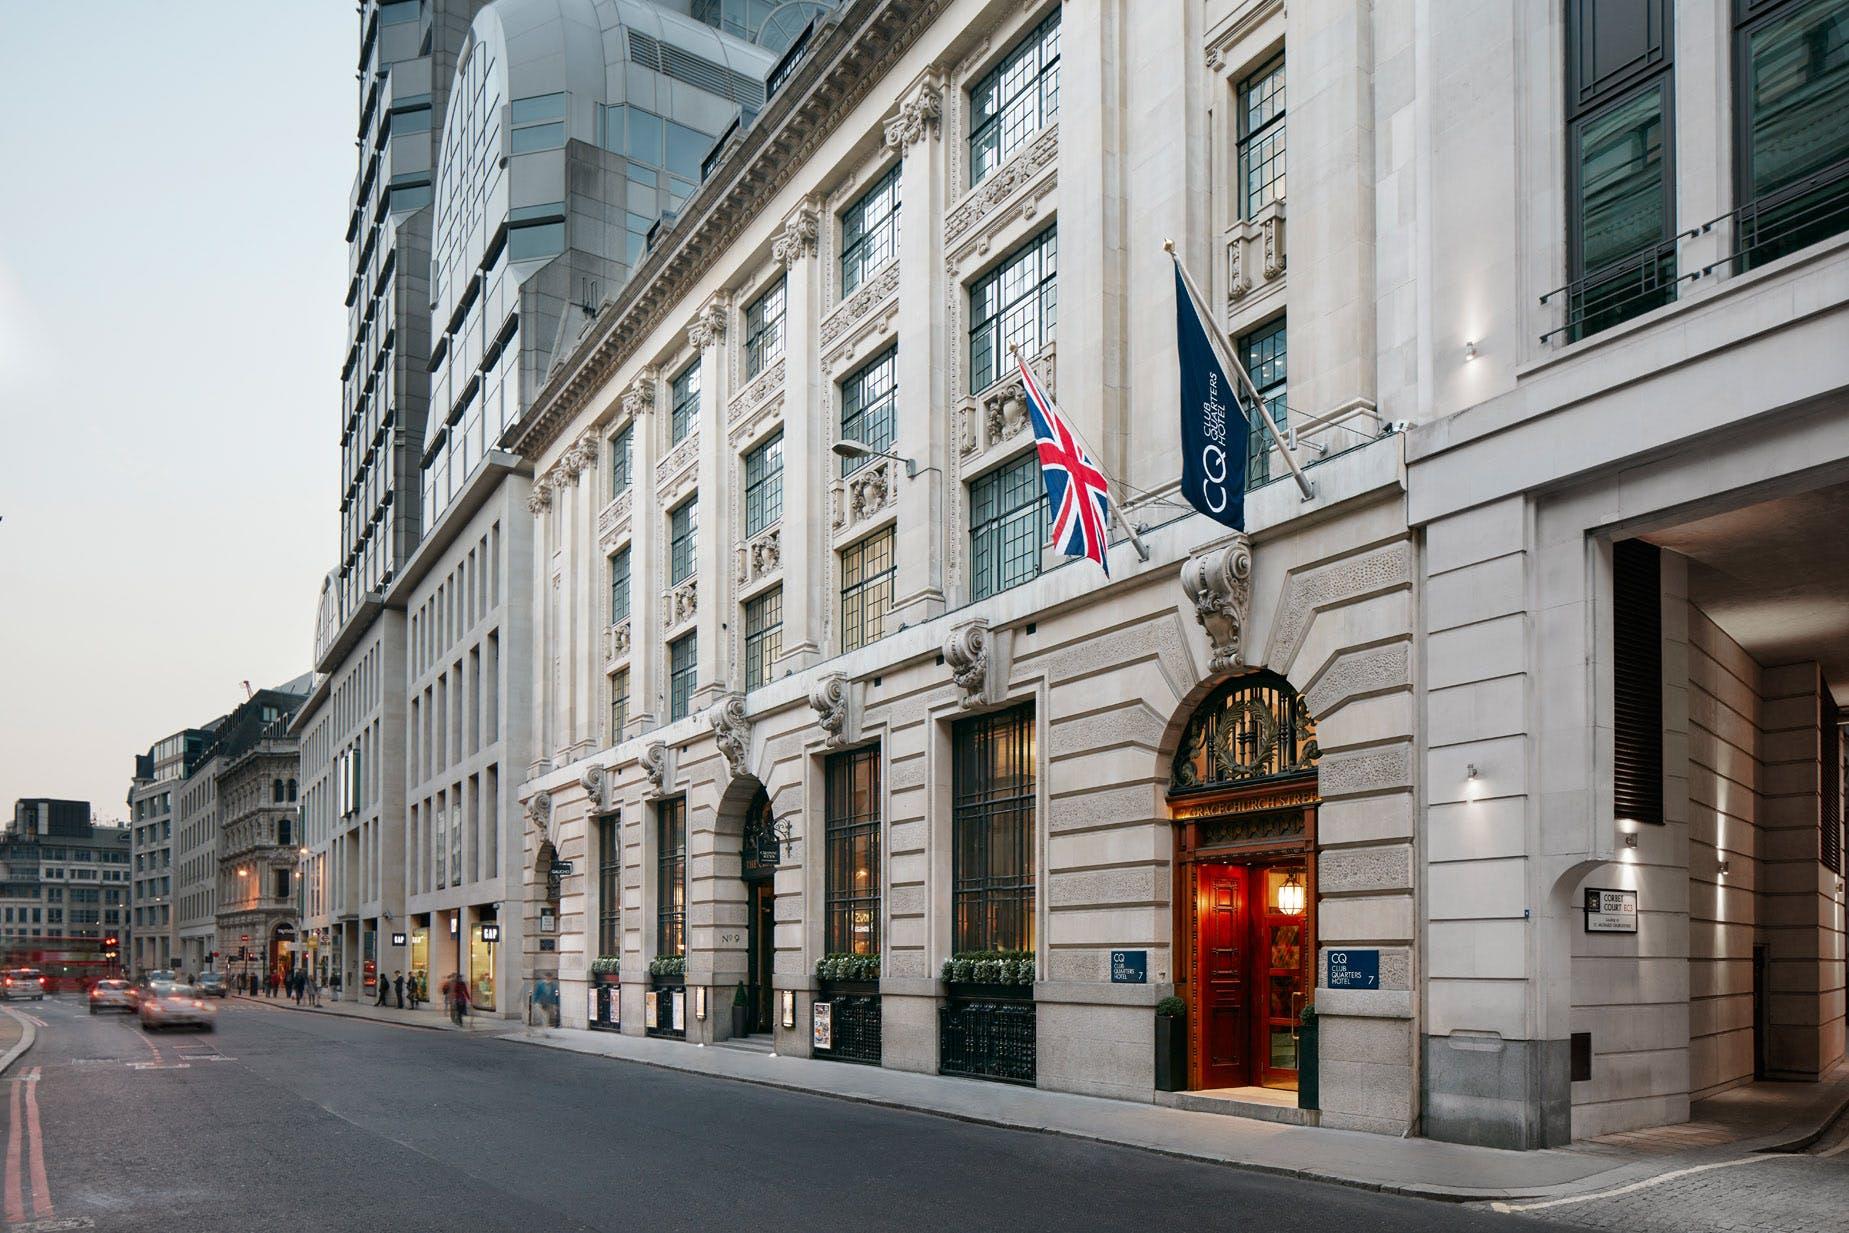 Exterior of Club Quarters Hotel, Gracechurch, London